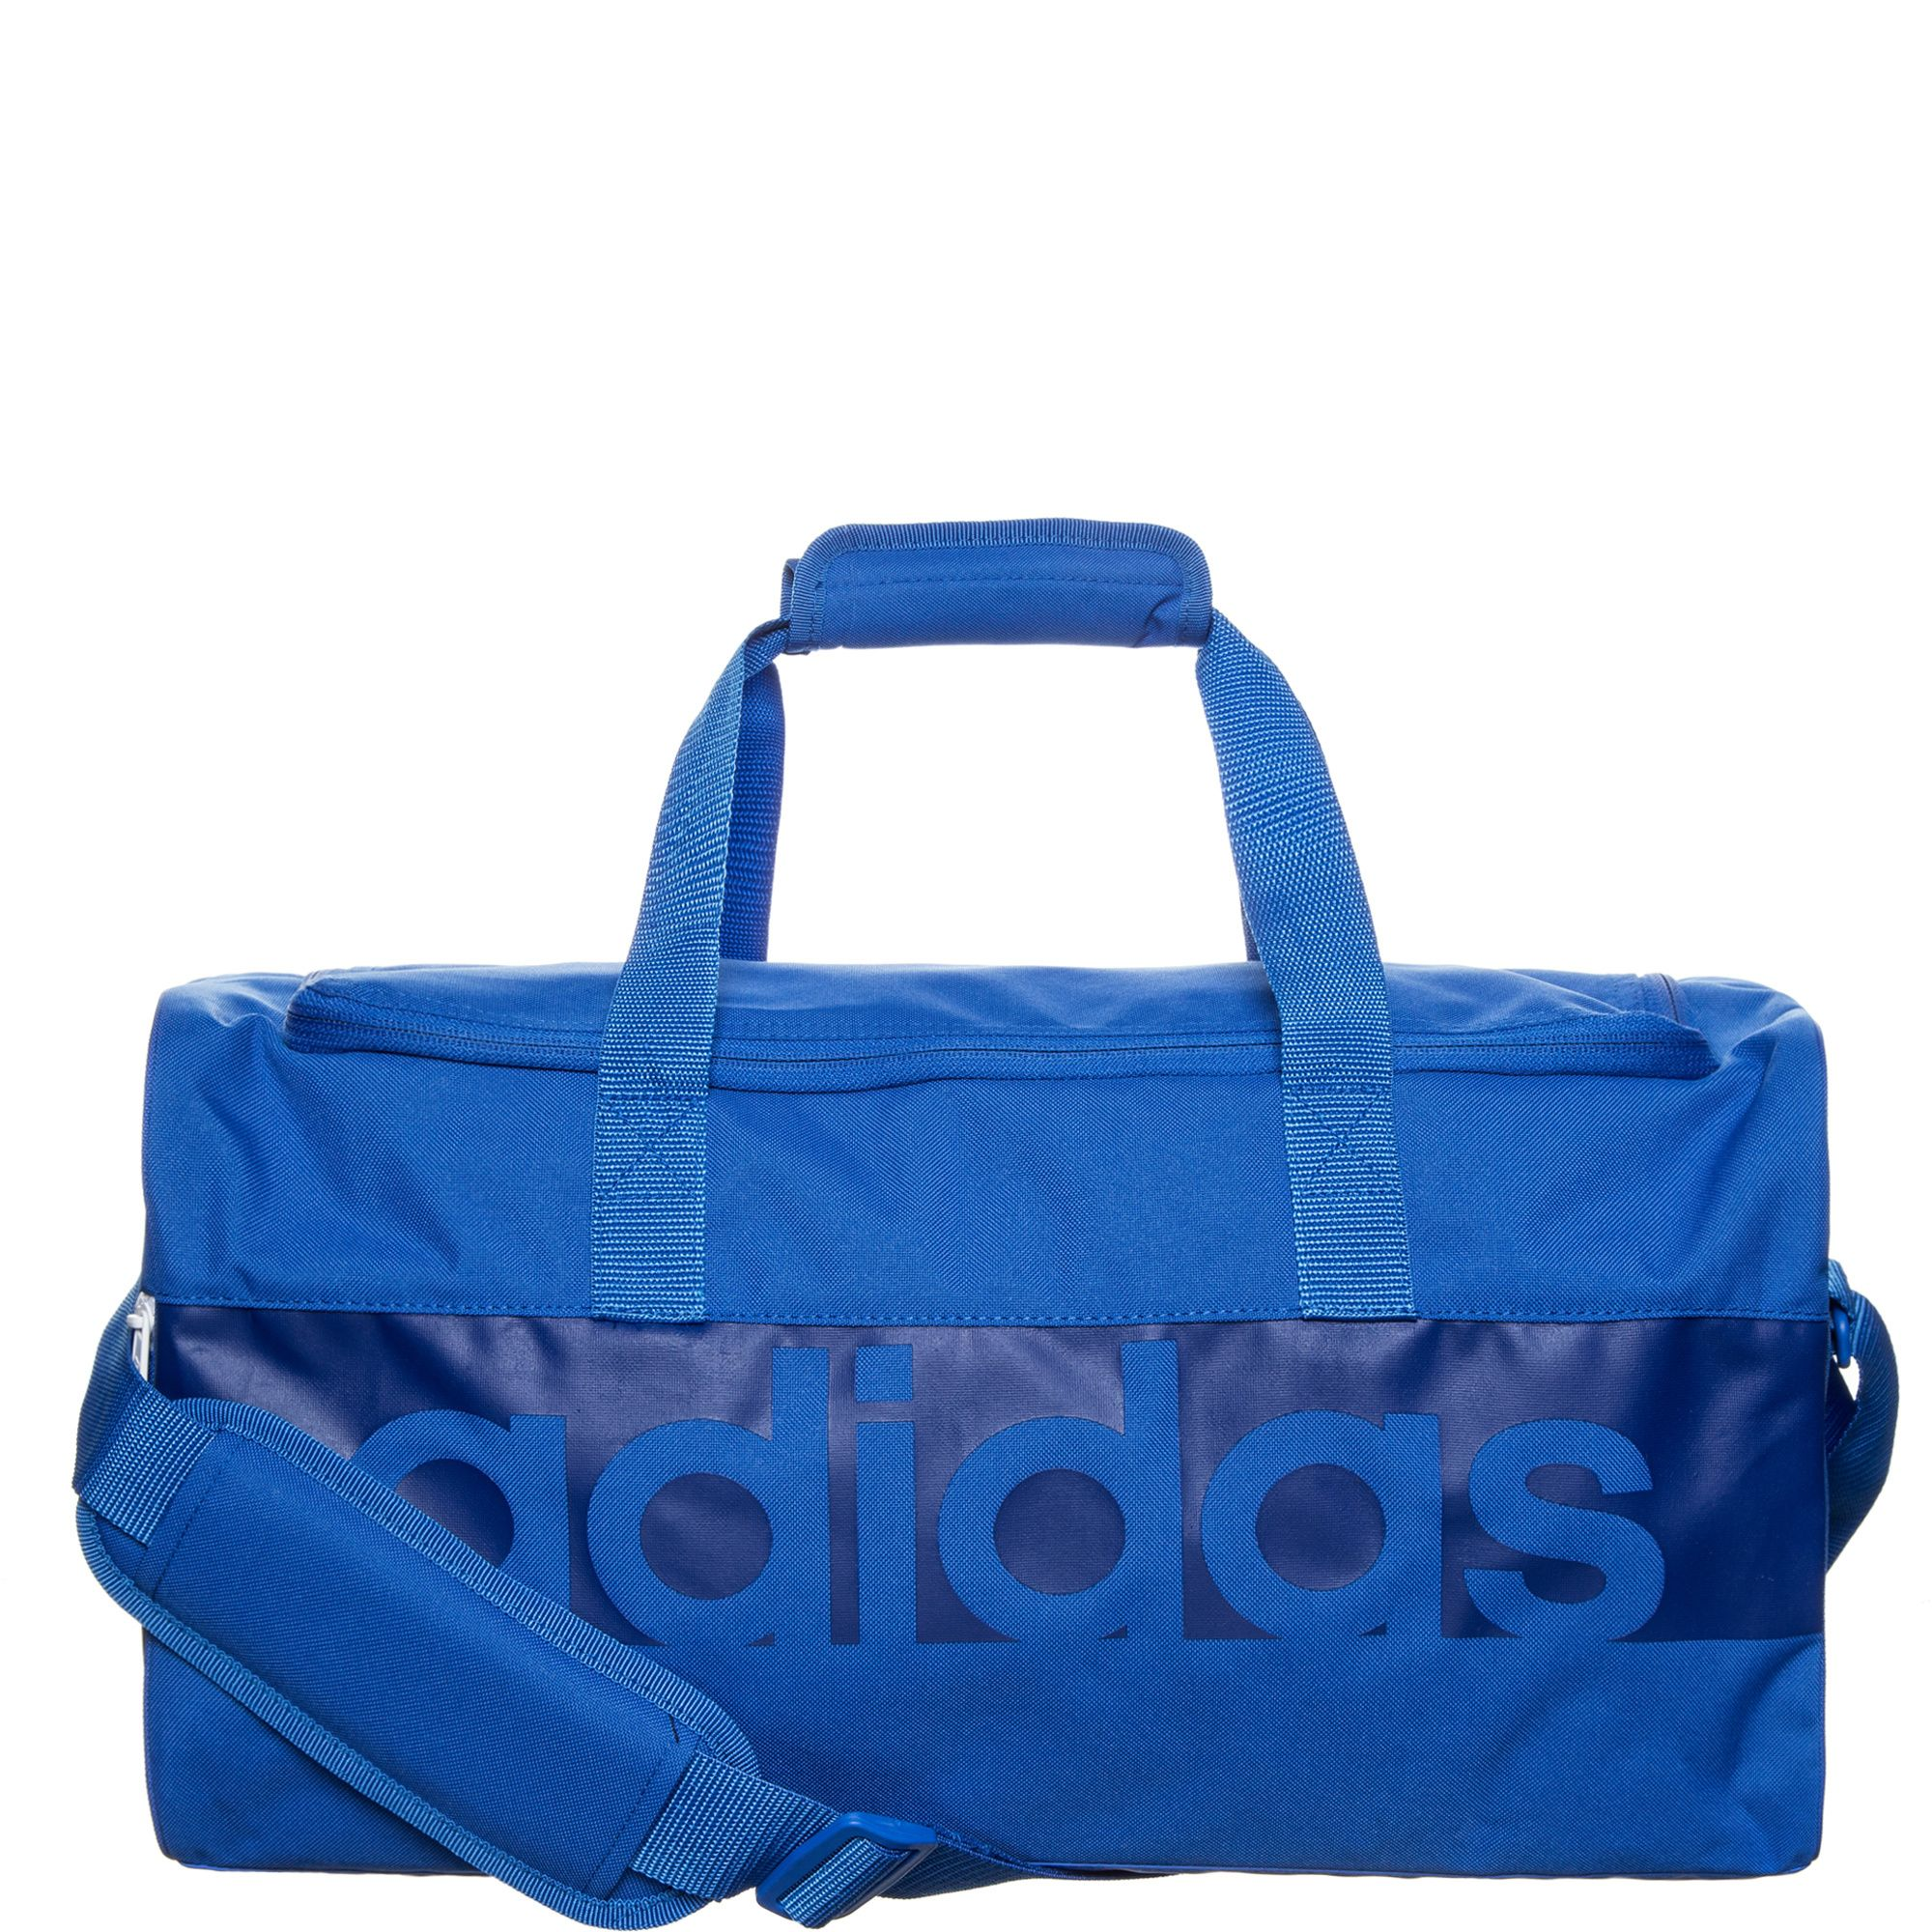 ADIDAS PERFORMANCE adidas Performance Tiro Linear Teambag Sporttasche Small